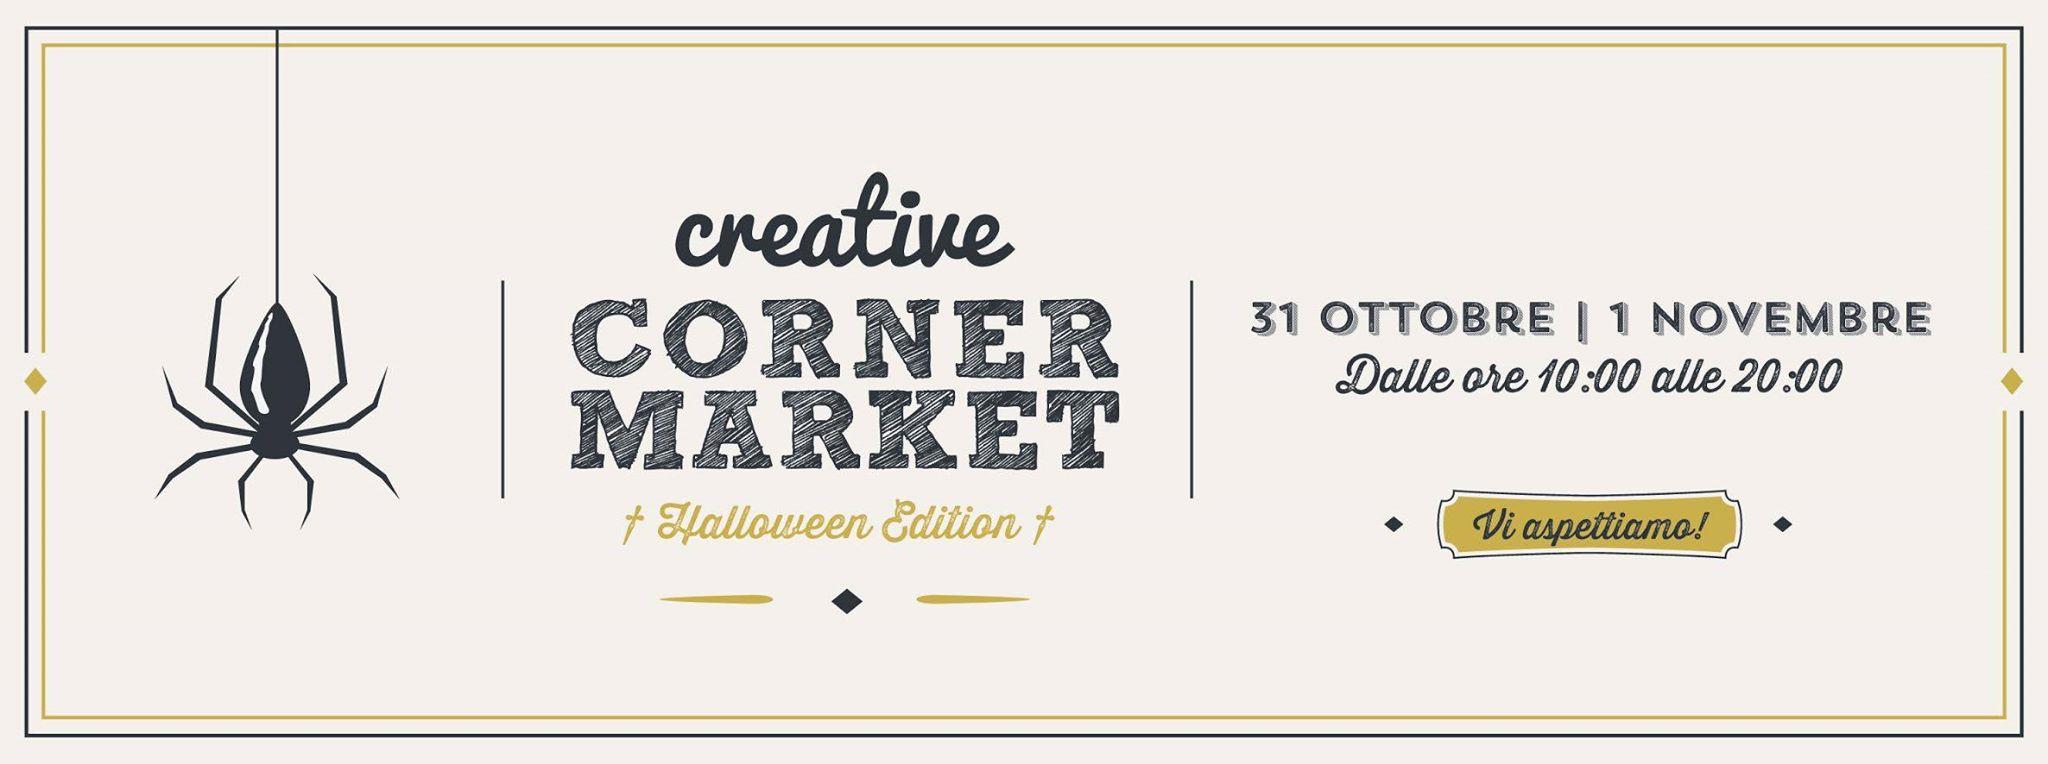 Creative Corner fra arte e fantasia